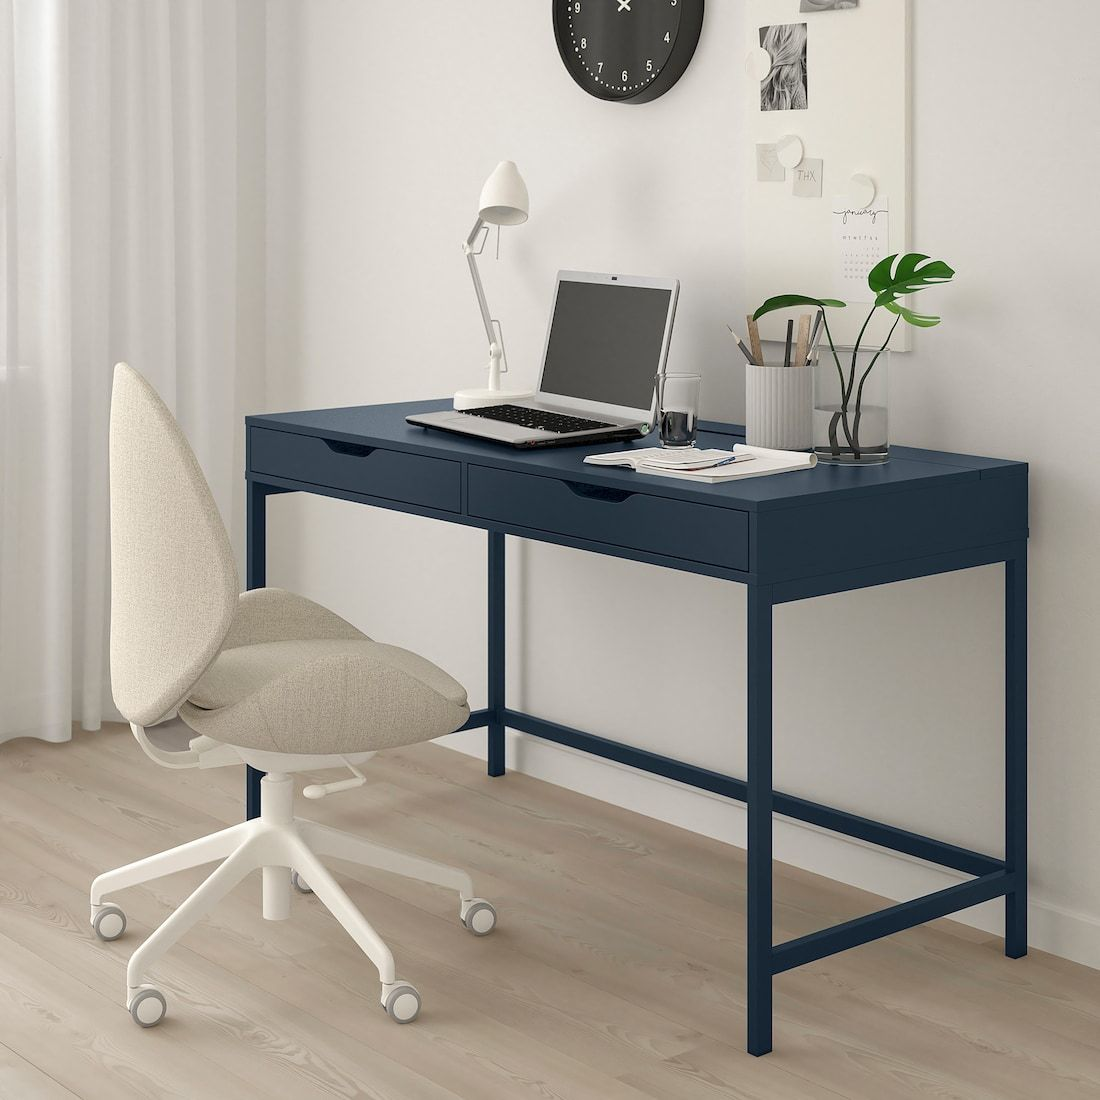 Alex Desk Blue 51 5 8x23 5 8 Ikea Ikea Alex Desk Alex Desk